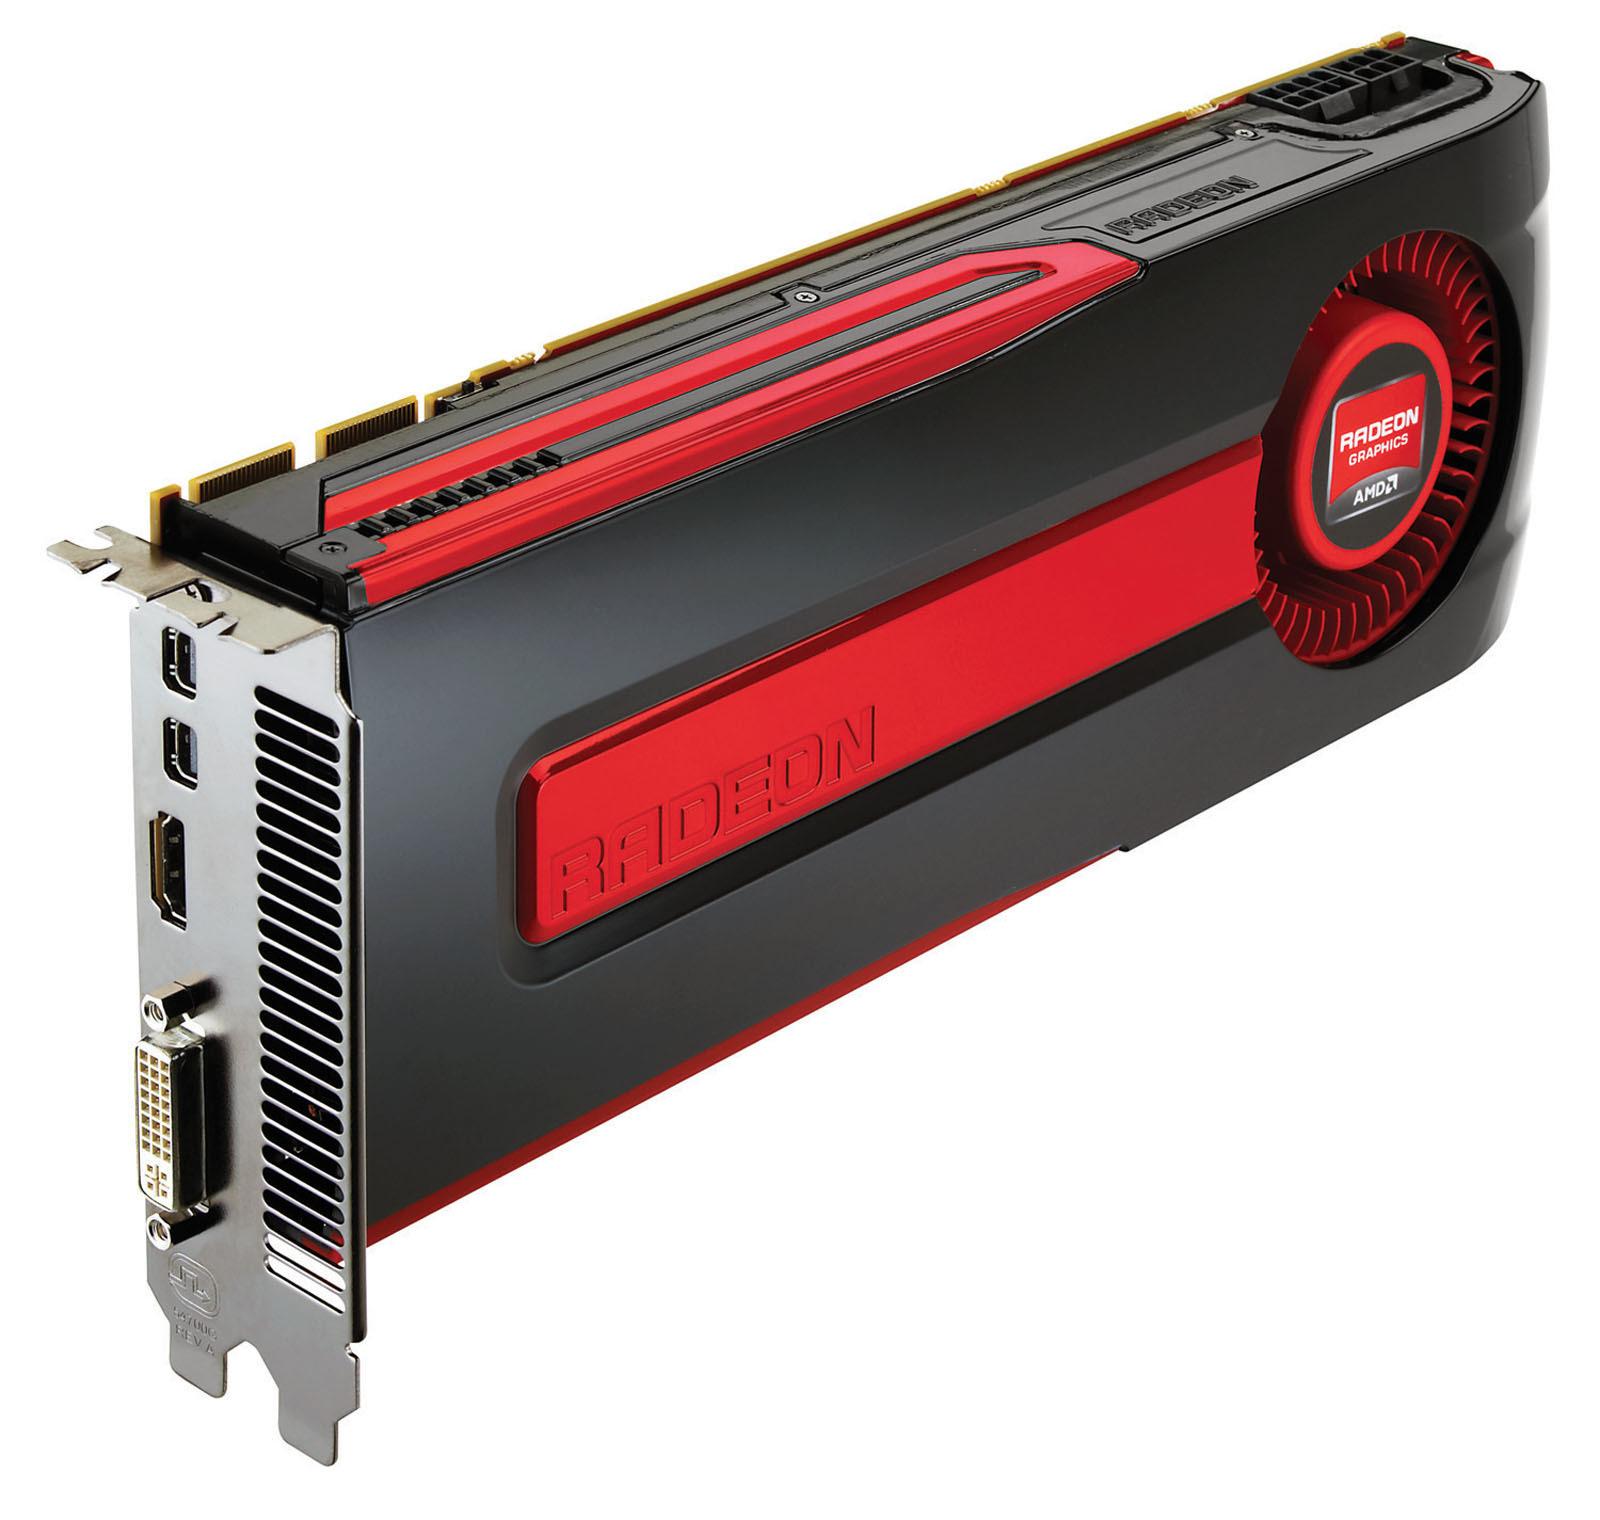 Купить видеокарту amd radeon hd 7800 купить видеокарту gtx 970 москве